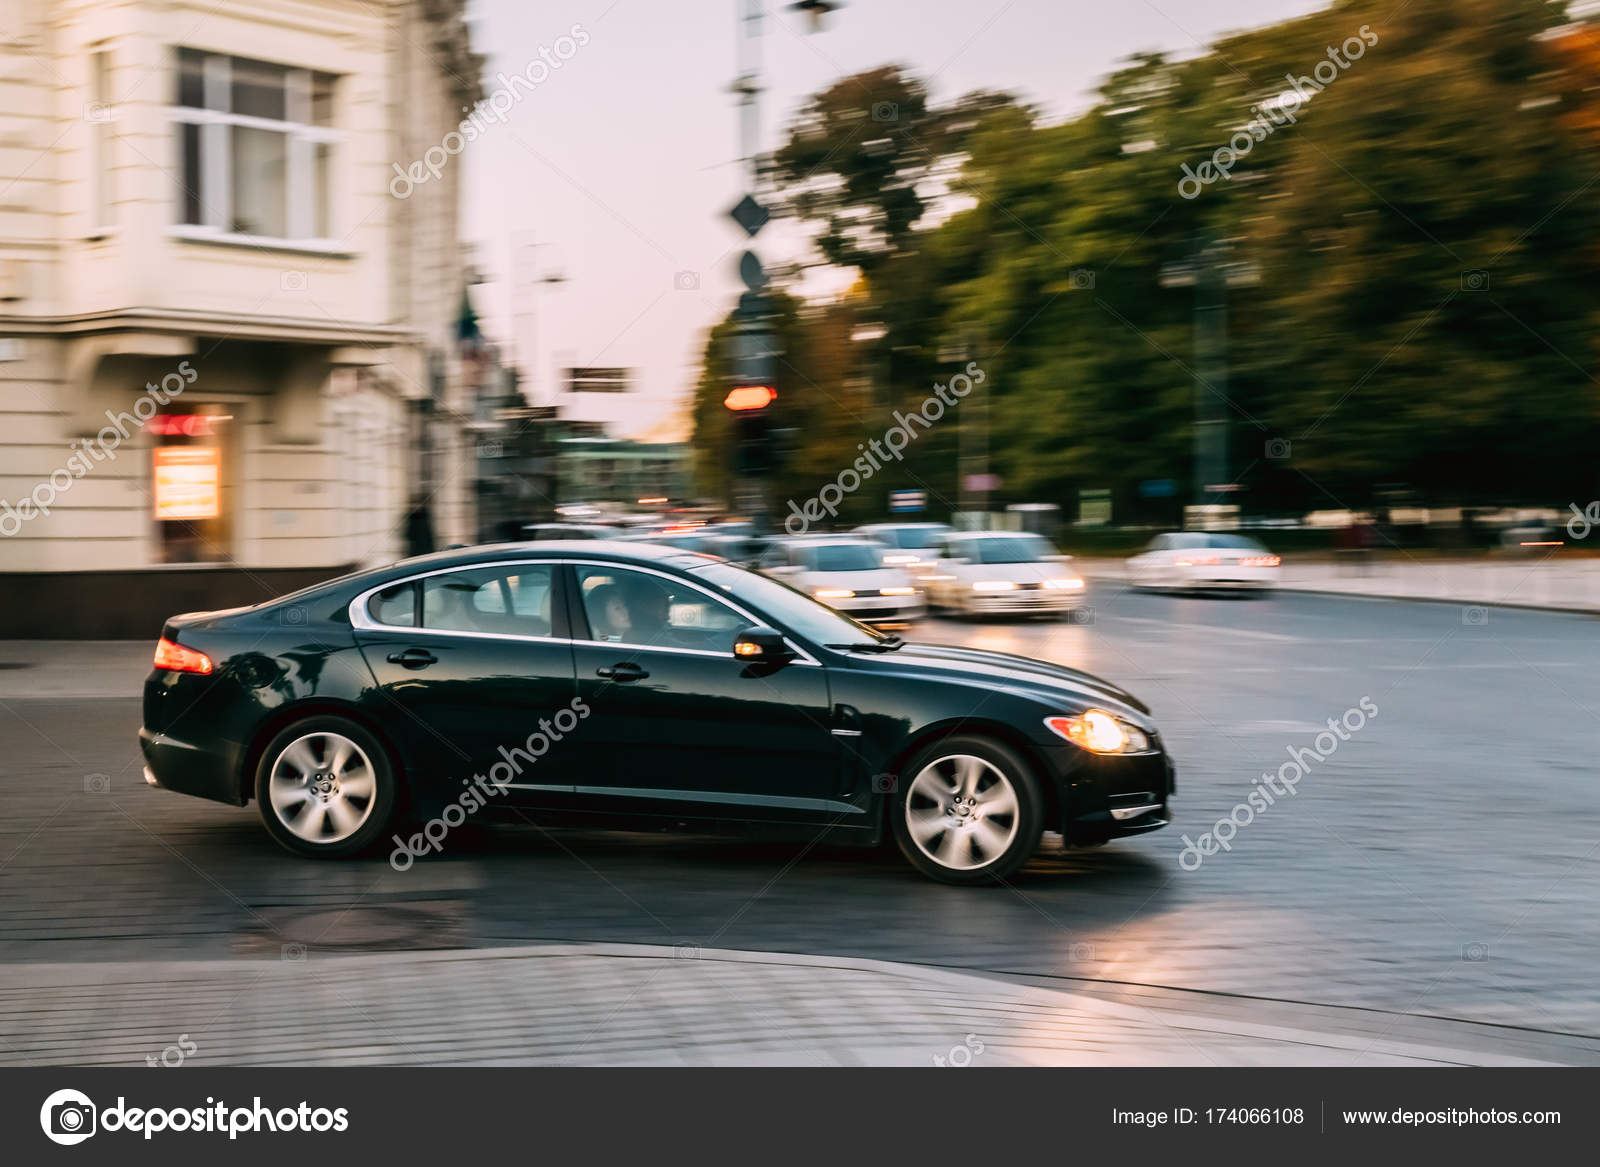 Vista Lateral Do Carro De Cor Preta Jaguar Movendo Se Na Rua U2014 Fotografia De